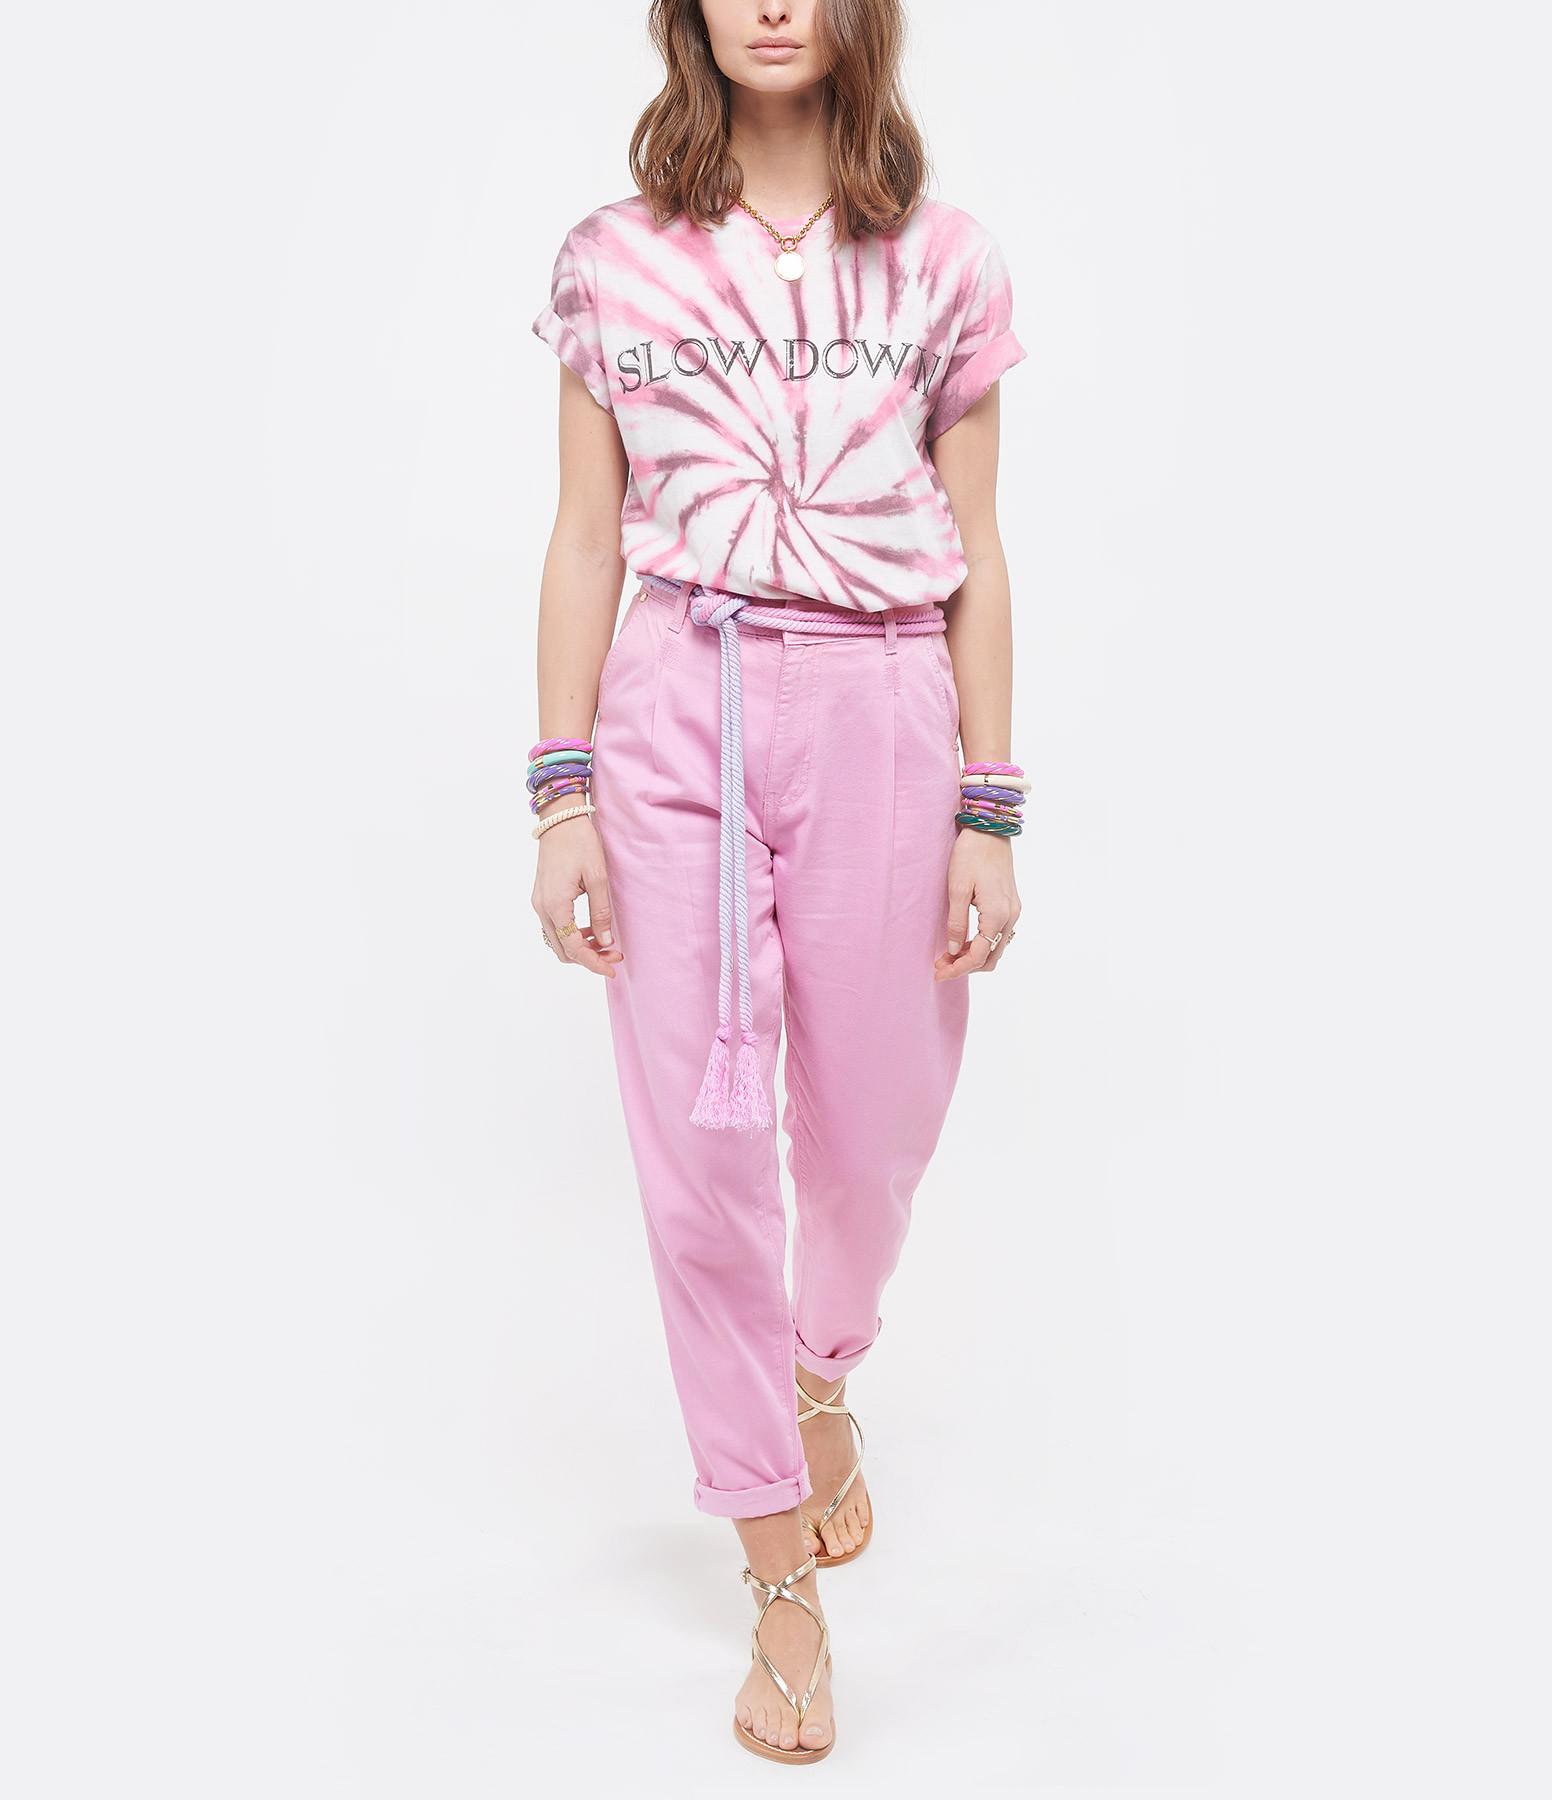 ISABEL MARANT ÉTOILE - Tee-shirt Zewel Coton Tie and Dye Rose